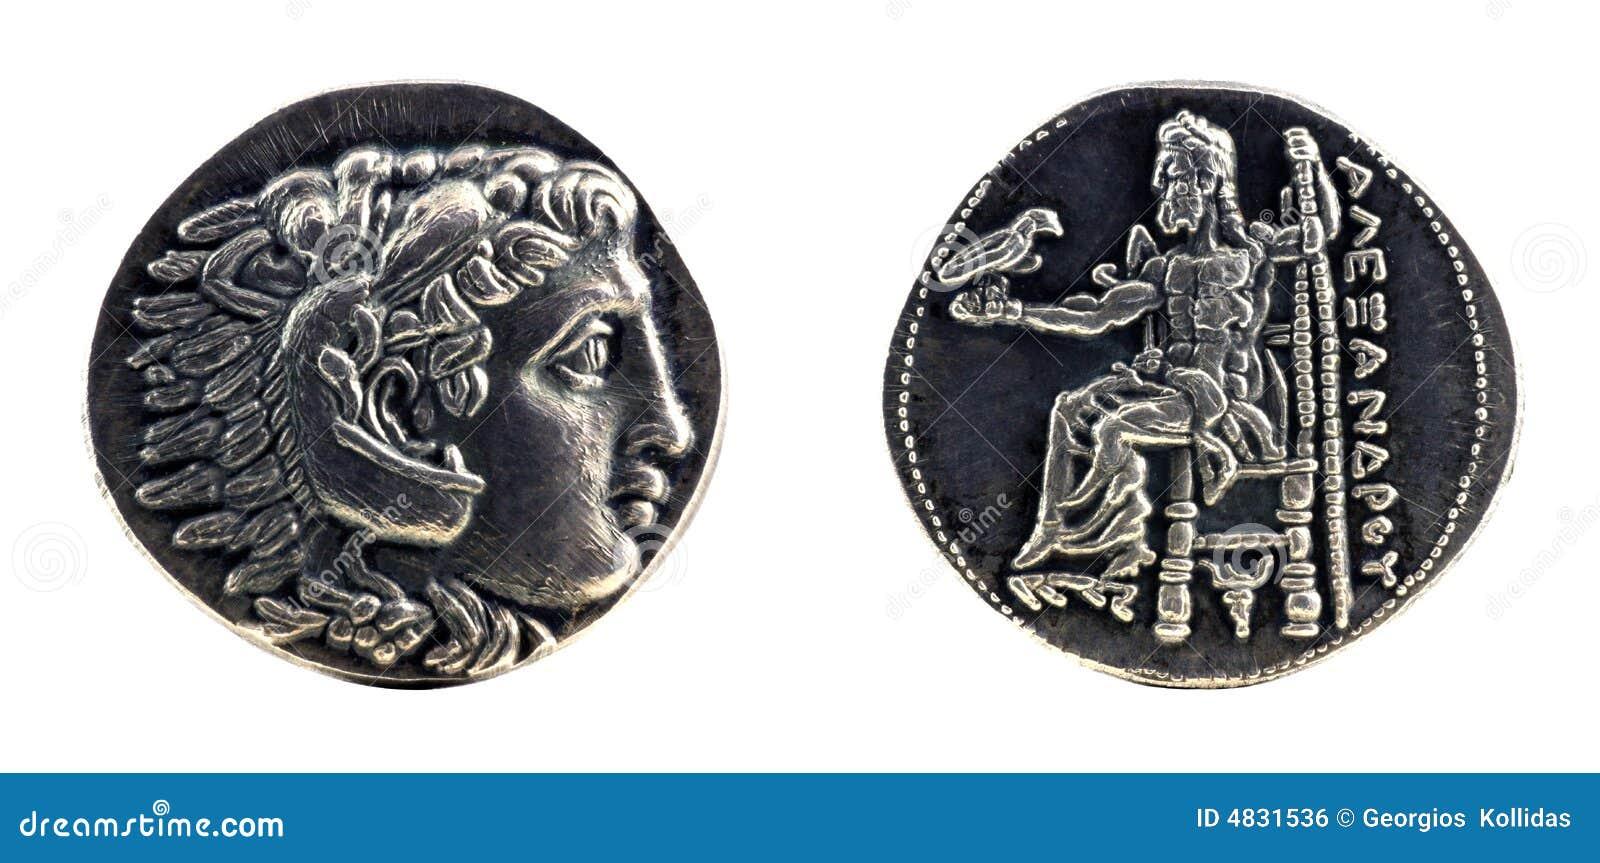 Alexander wielki tetradrachm greka srebra